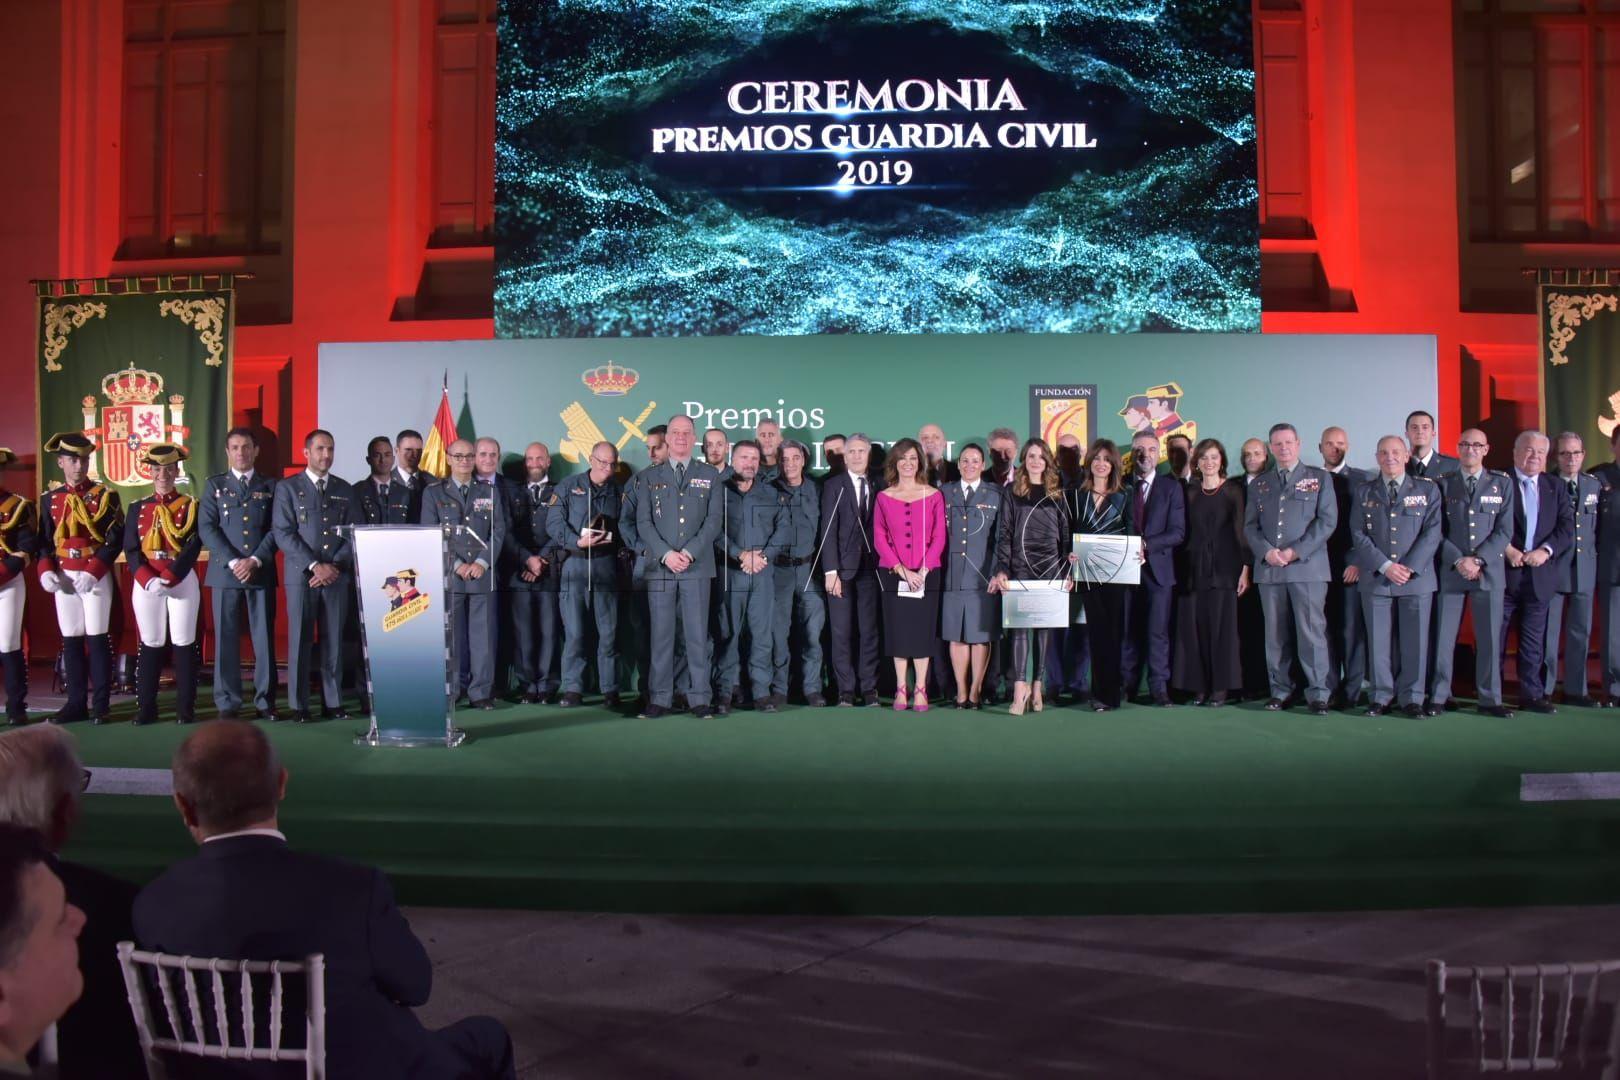 premios-guardia-civil-2019-grupo